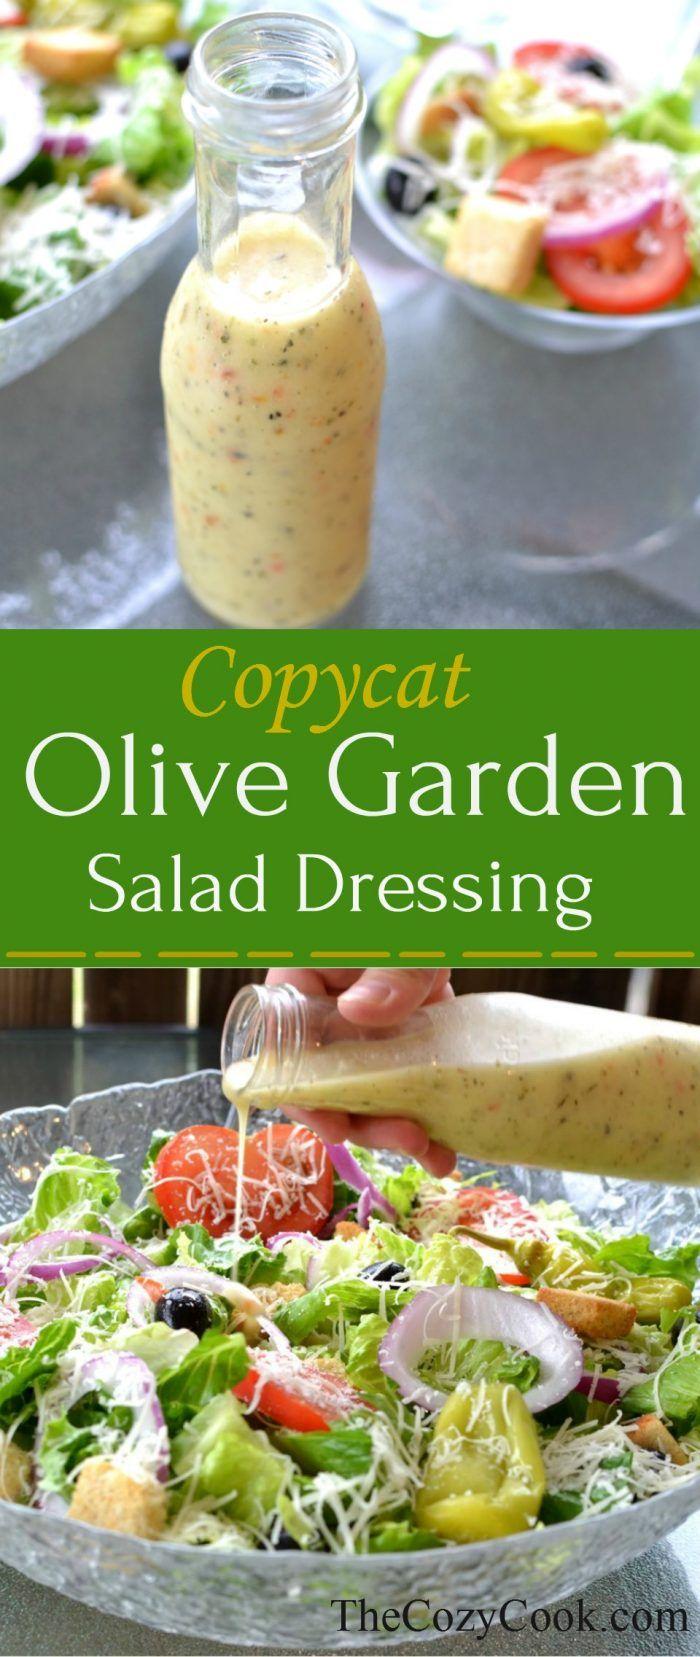 This homemade copycat Olive Garden Salad Dressing.